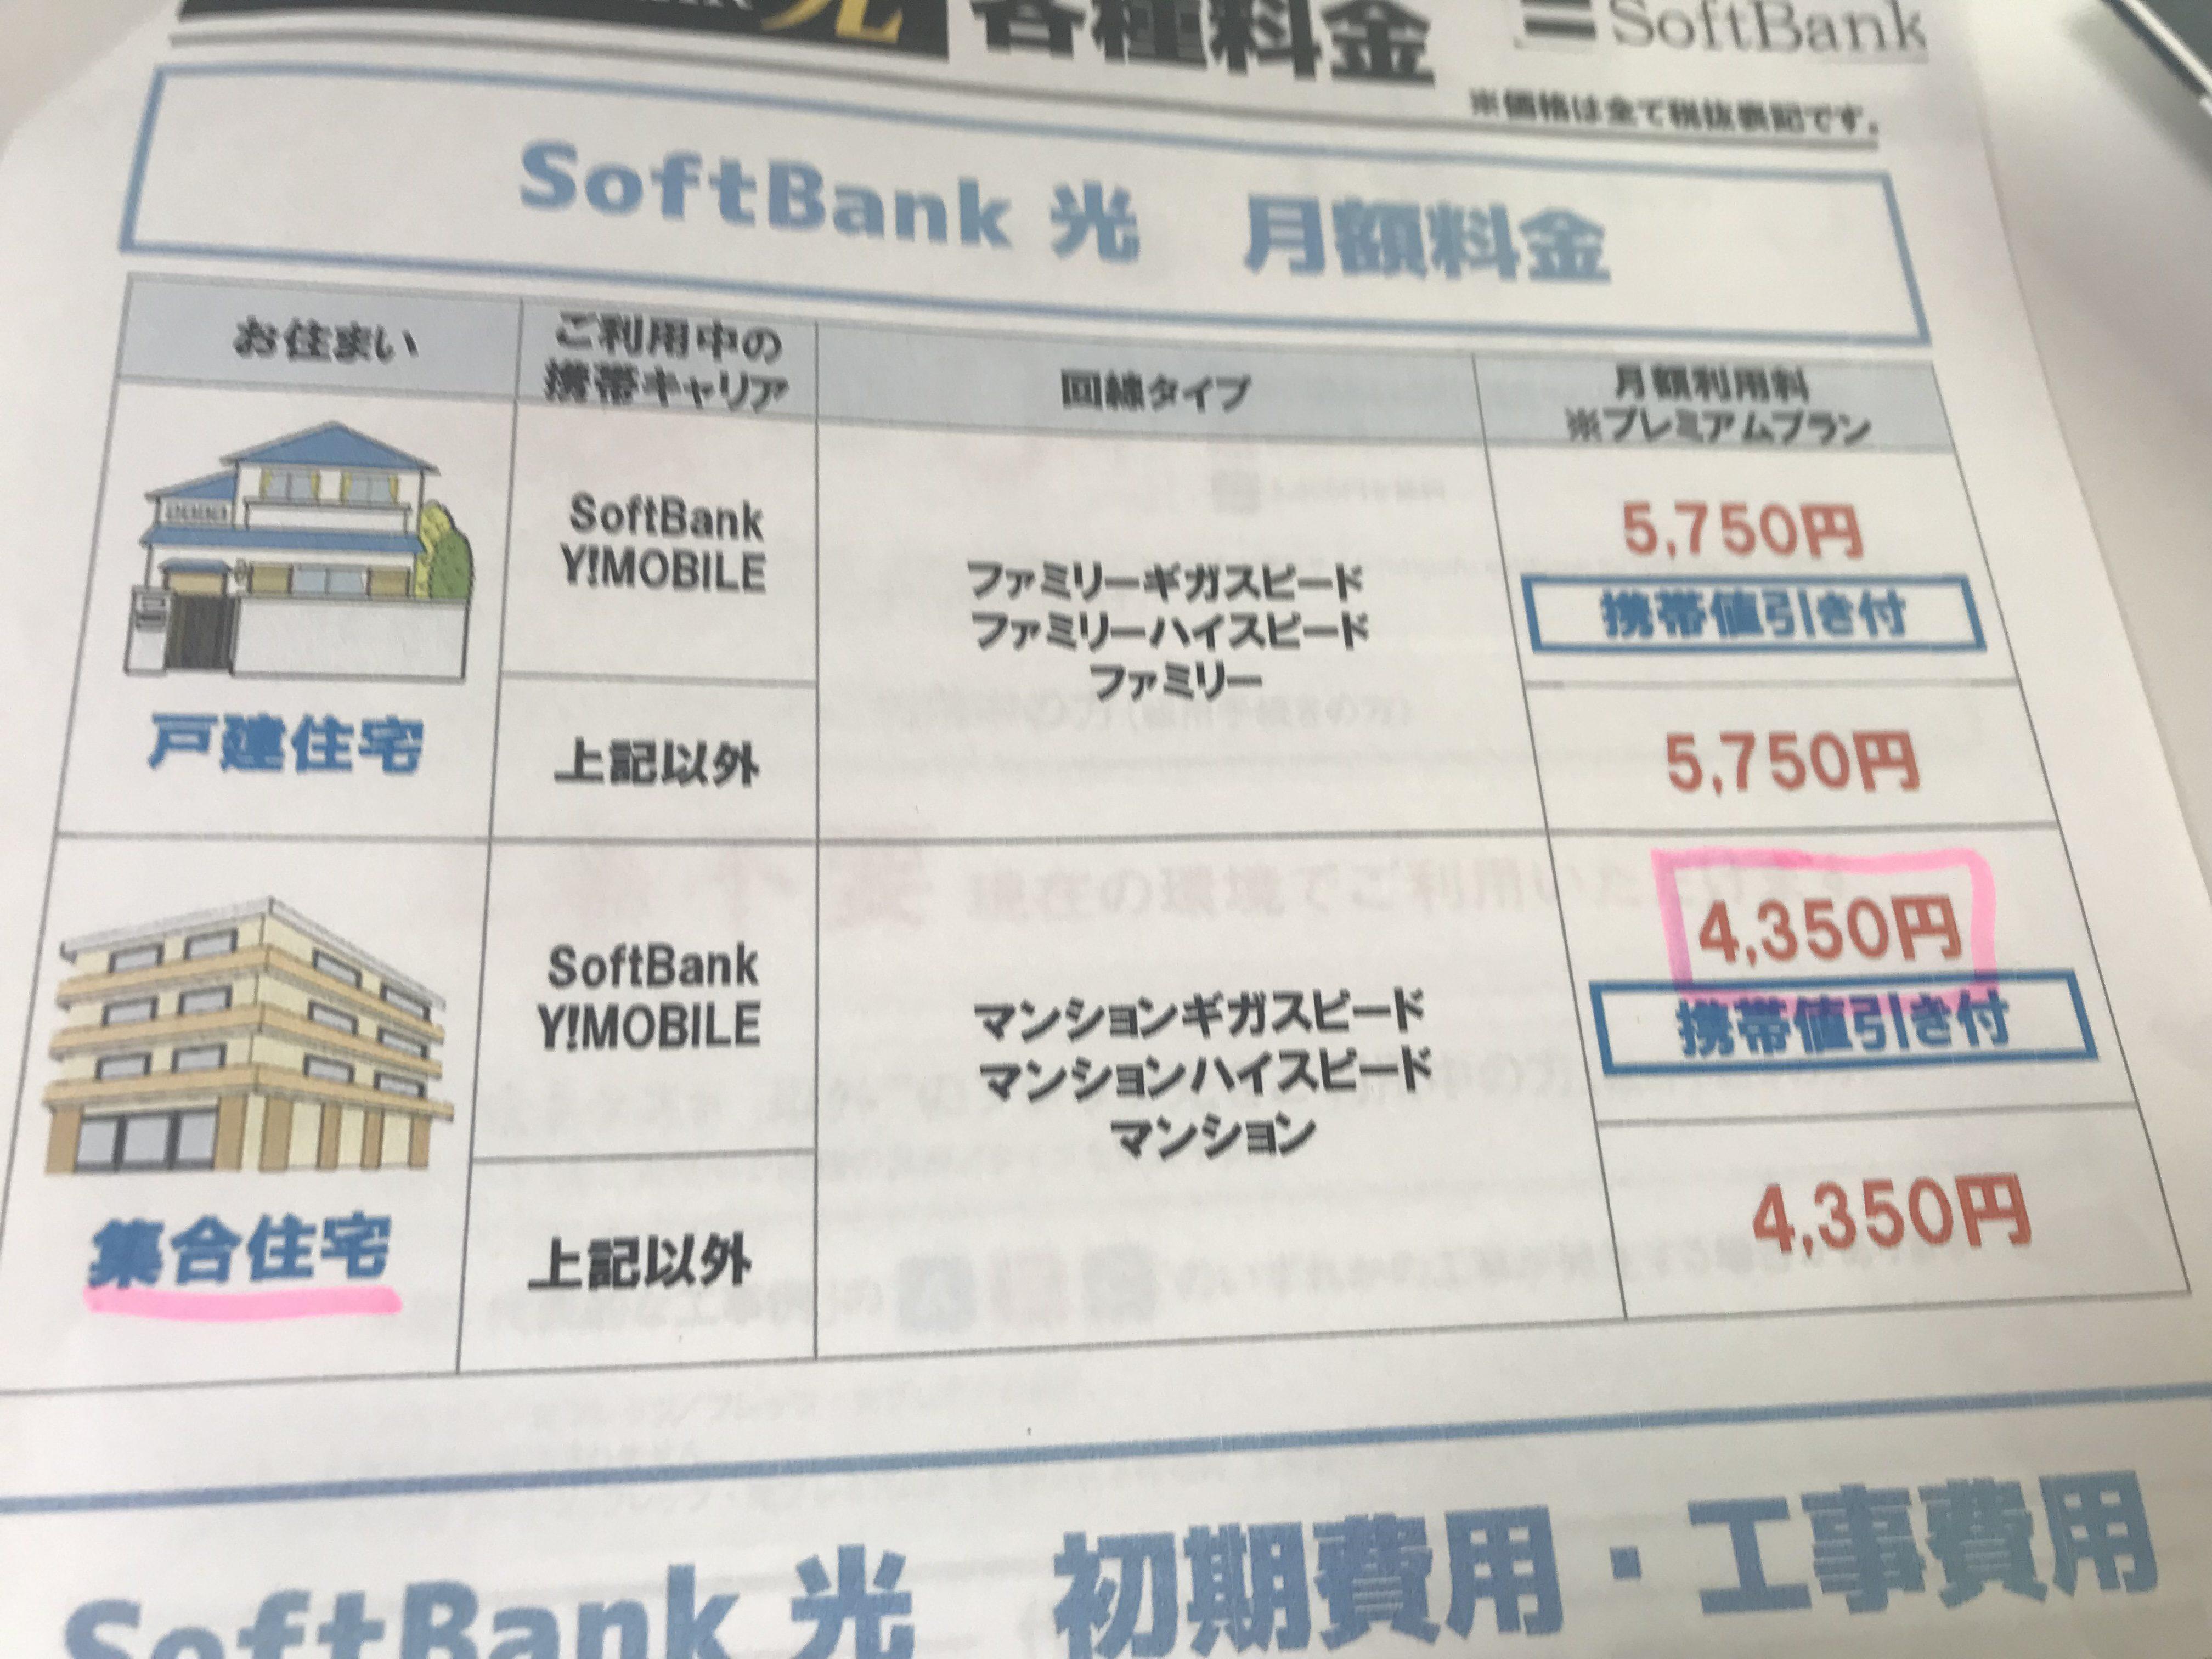 Softbank光加入時の説明資料